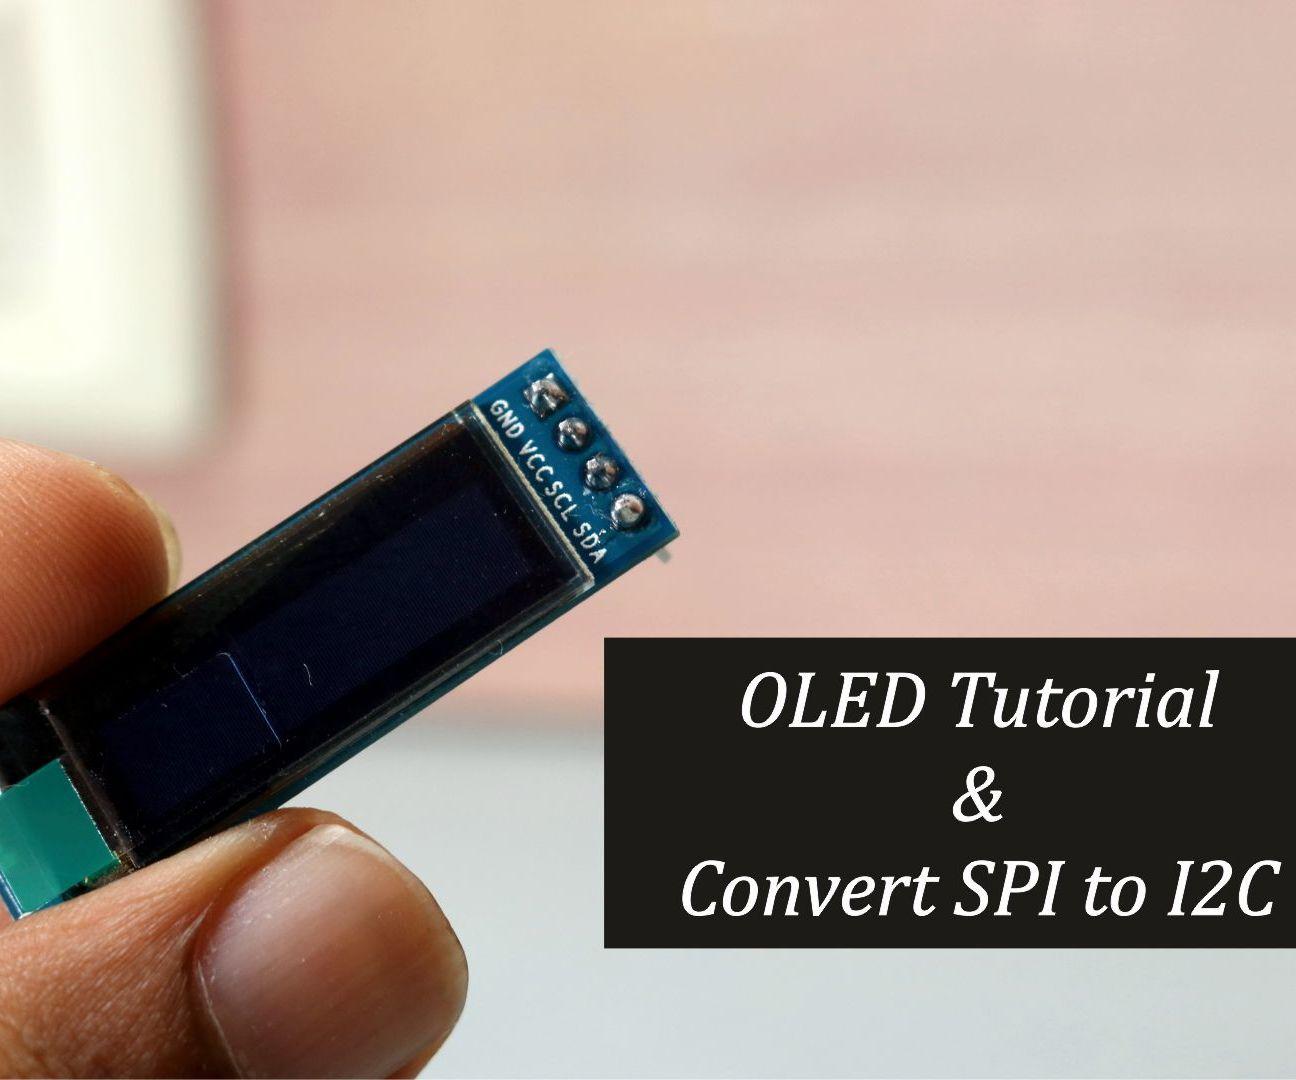 OLED Tutorial   Convert SPI to I2C